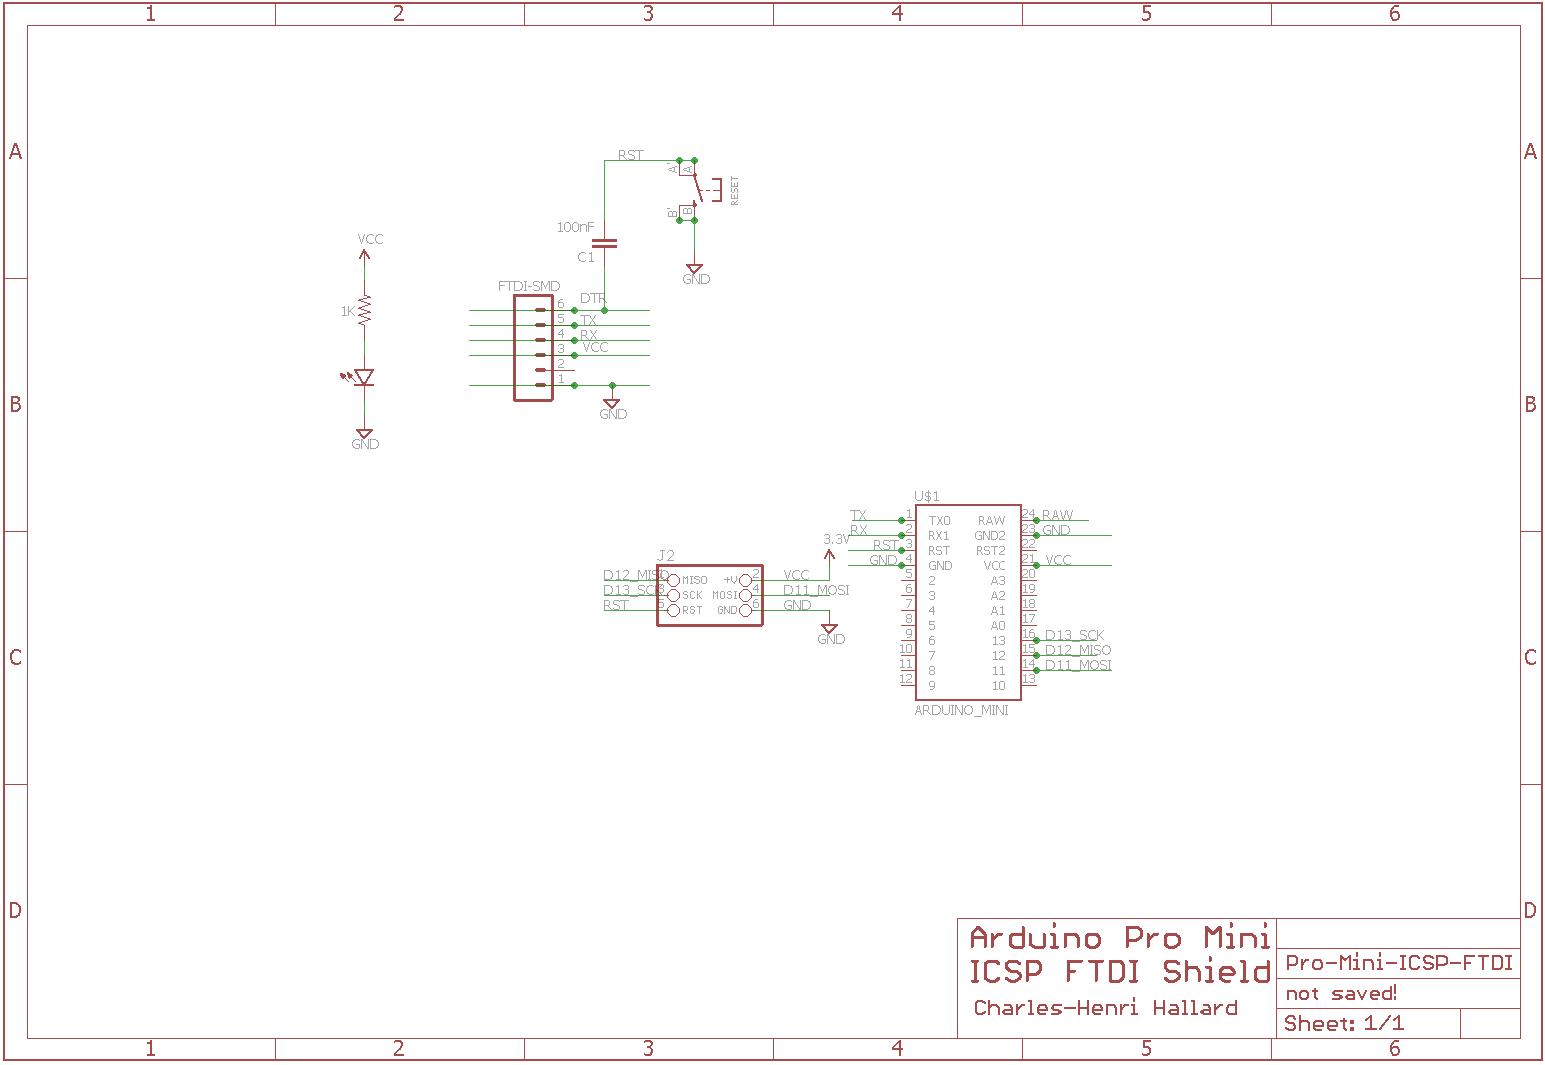 GitHub - hallard/Pro-Mini-ICSP-FTDI: Arduino Pro Mini ICSP and FTDI on arduino uno schematic, arduino mega schematic, arduino circuit schematic, arduino board schematic, arduino shield schematic, switch schematic, arduino nano schematic, arduino servo projects,